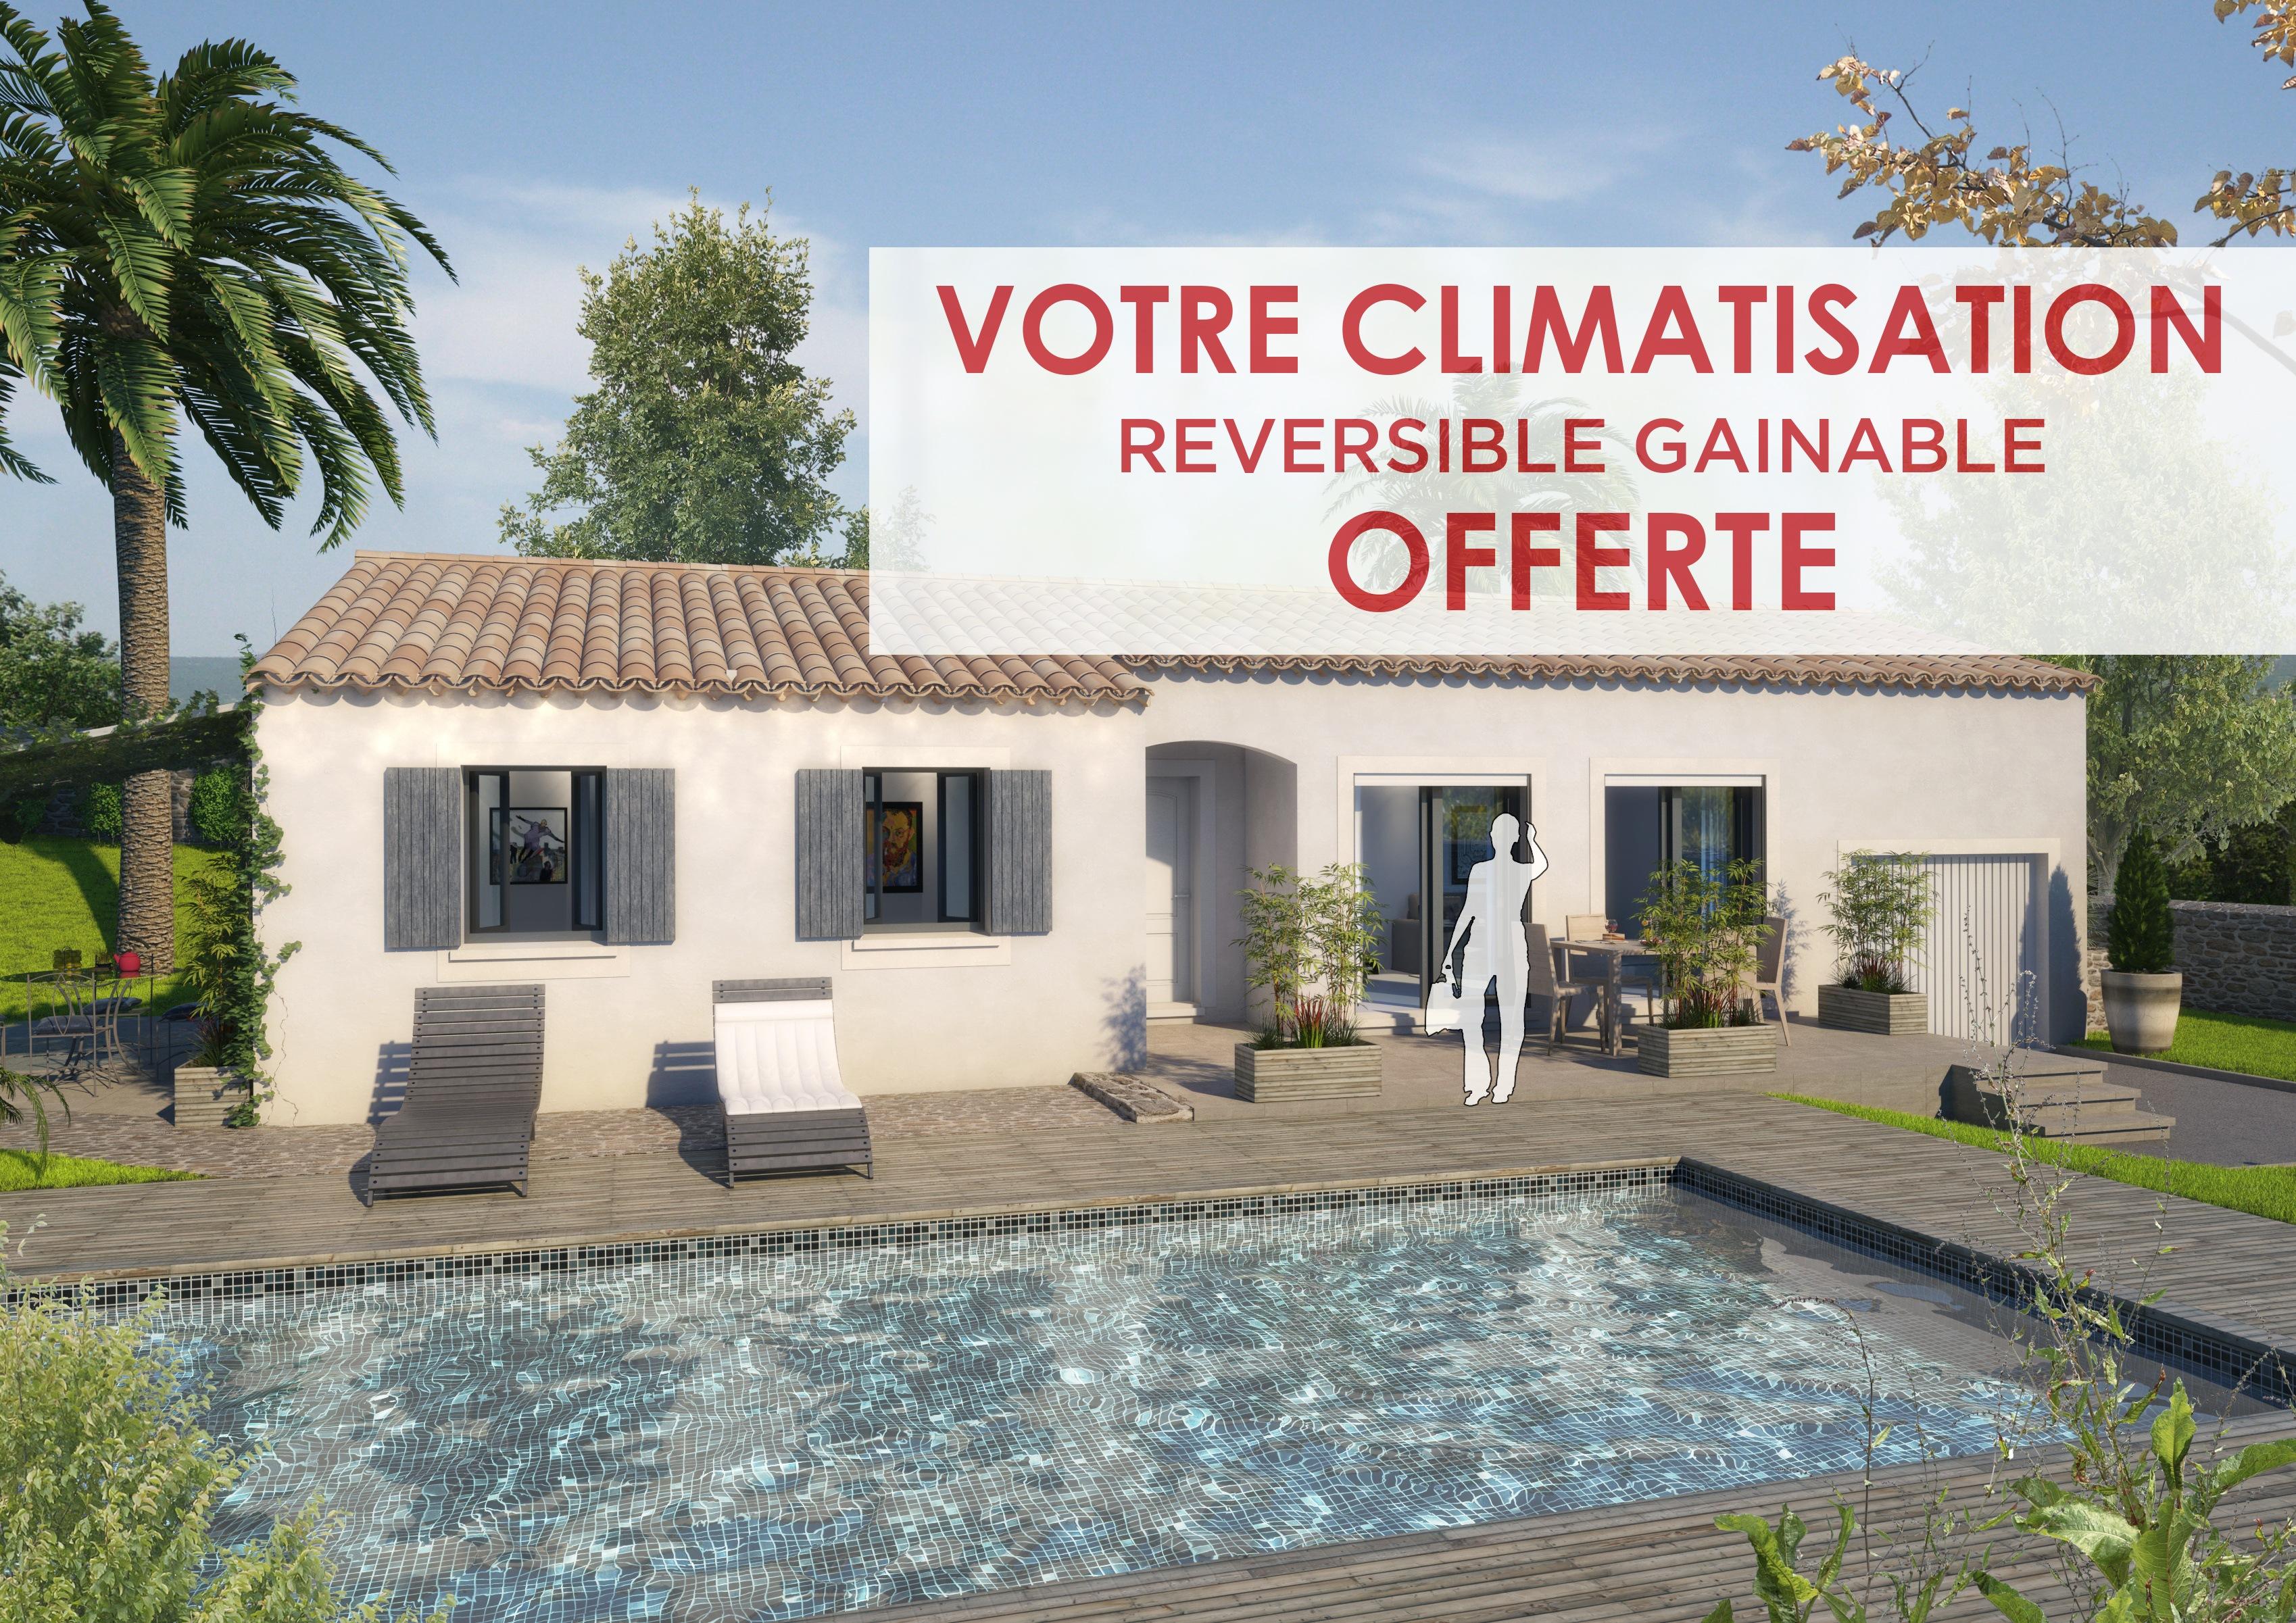 Maisons + Terrains du constructeur ART ET TRADITIONS MEDITERRANEE • 90 m² • ROQUEMAURE